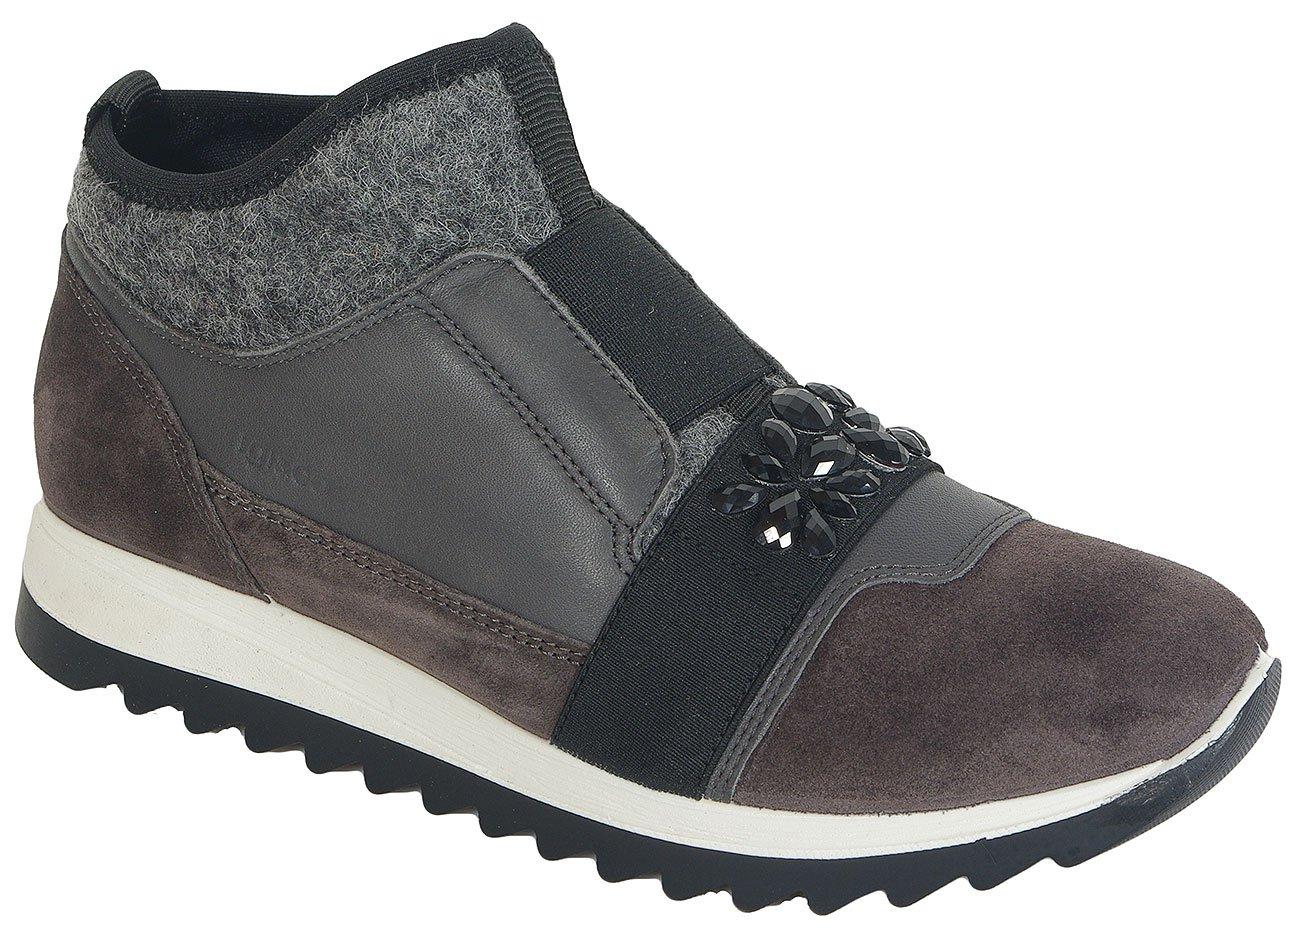 igi&co 8738 Nappa Vel Grigio sneakers